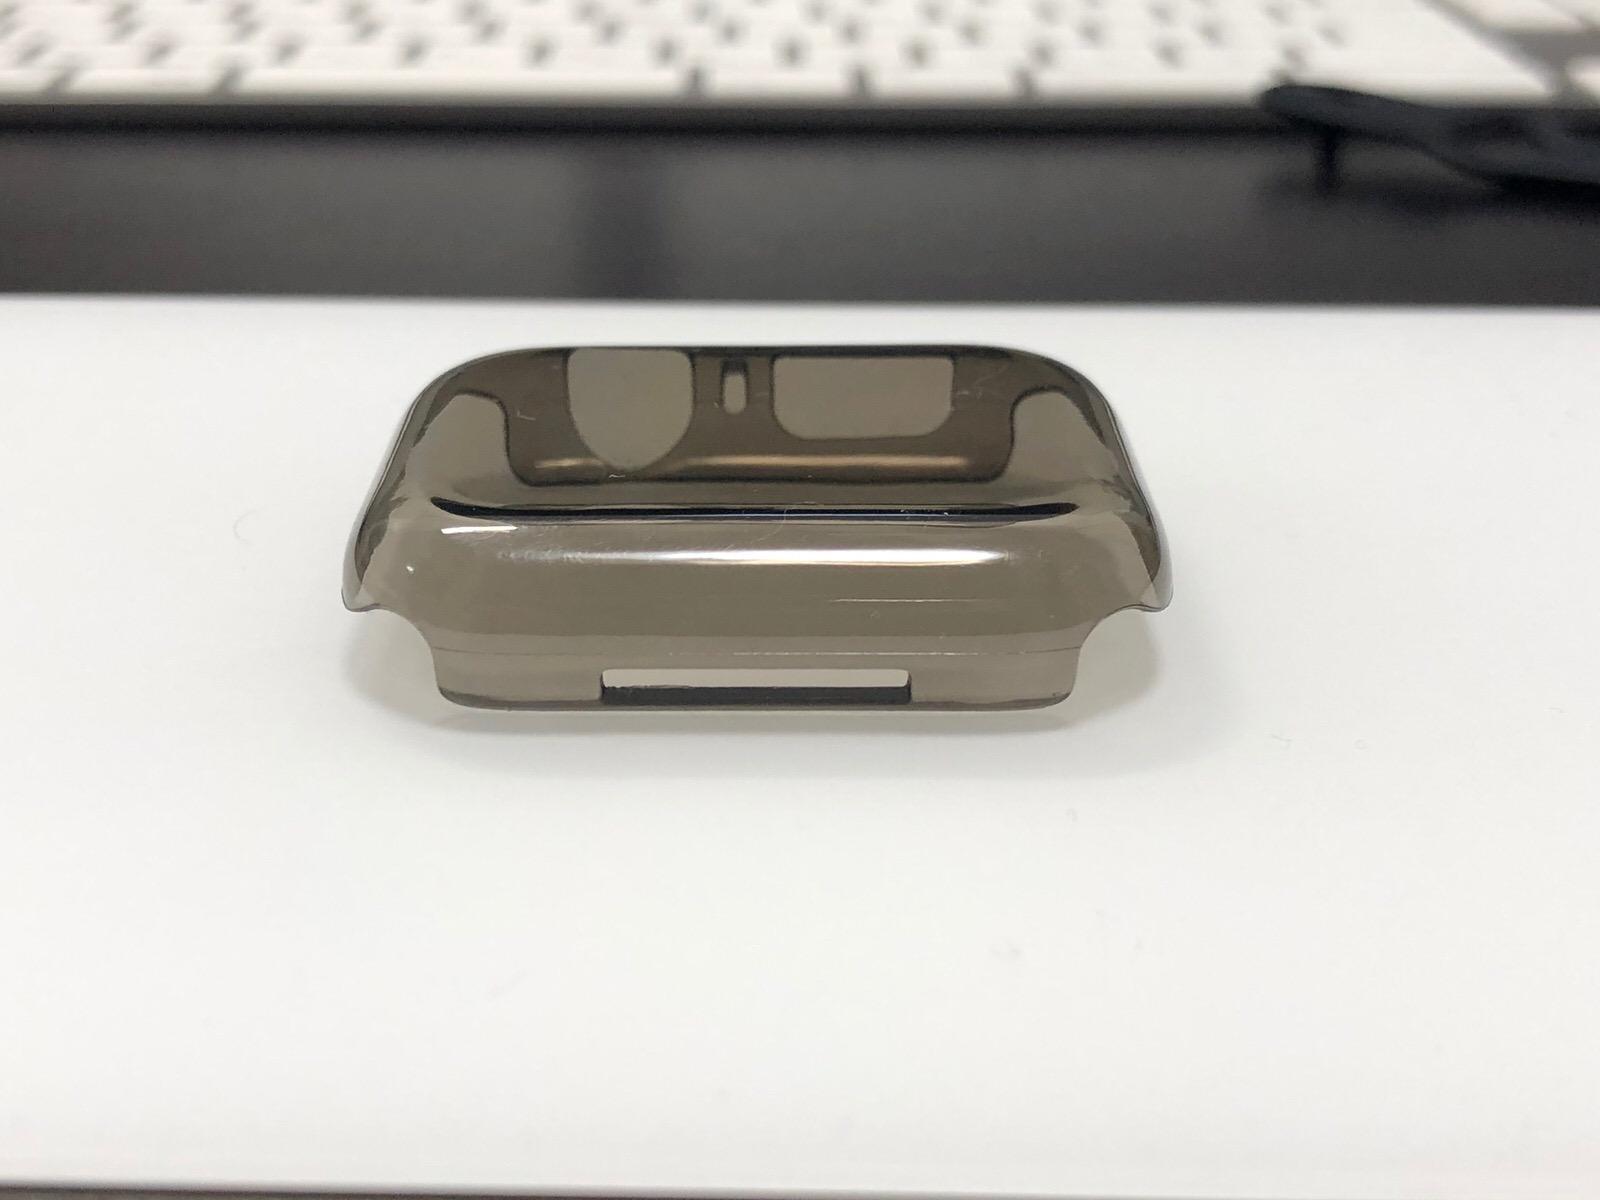 casualcatch Apple watch4 ケース 保護ケース カバー-4